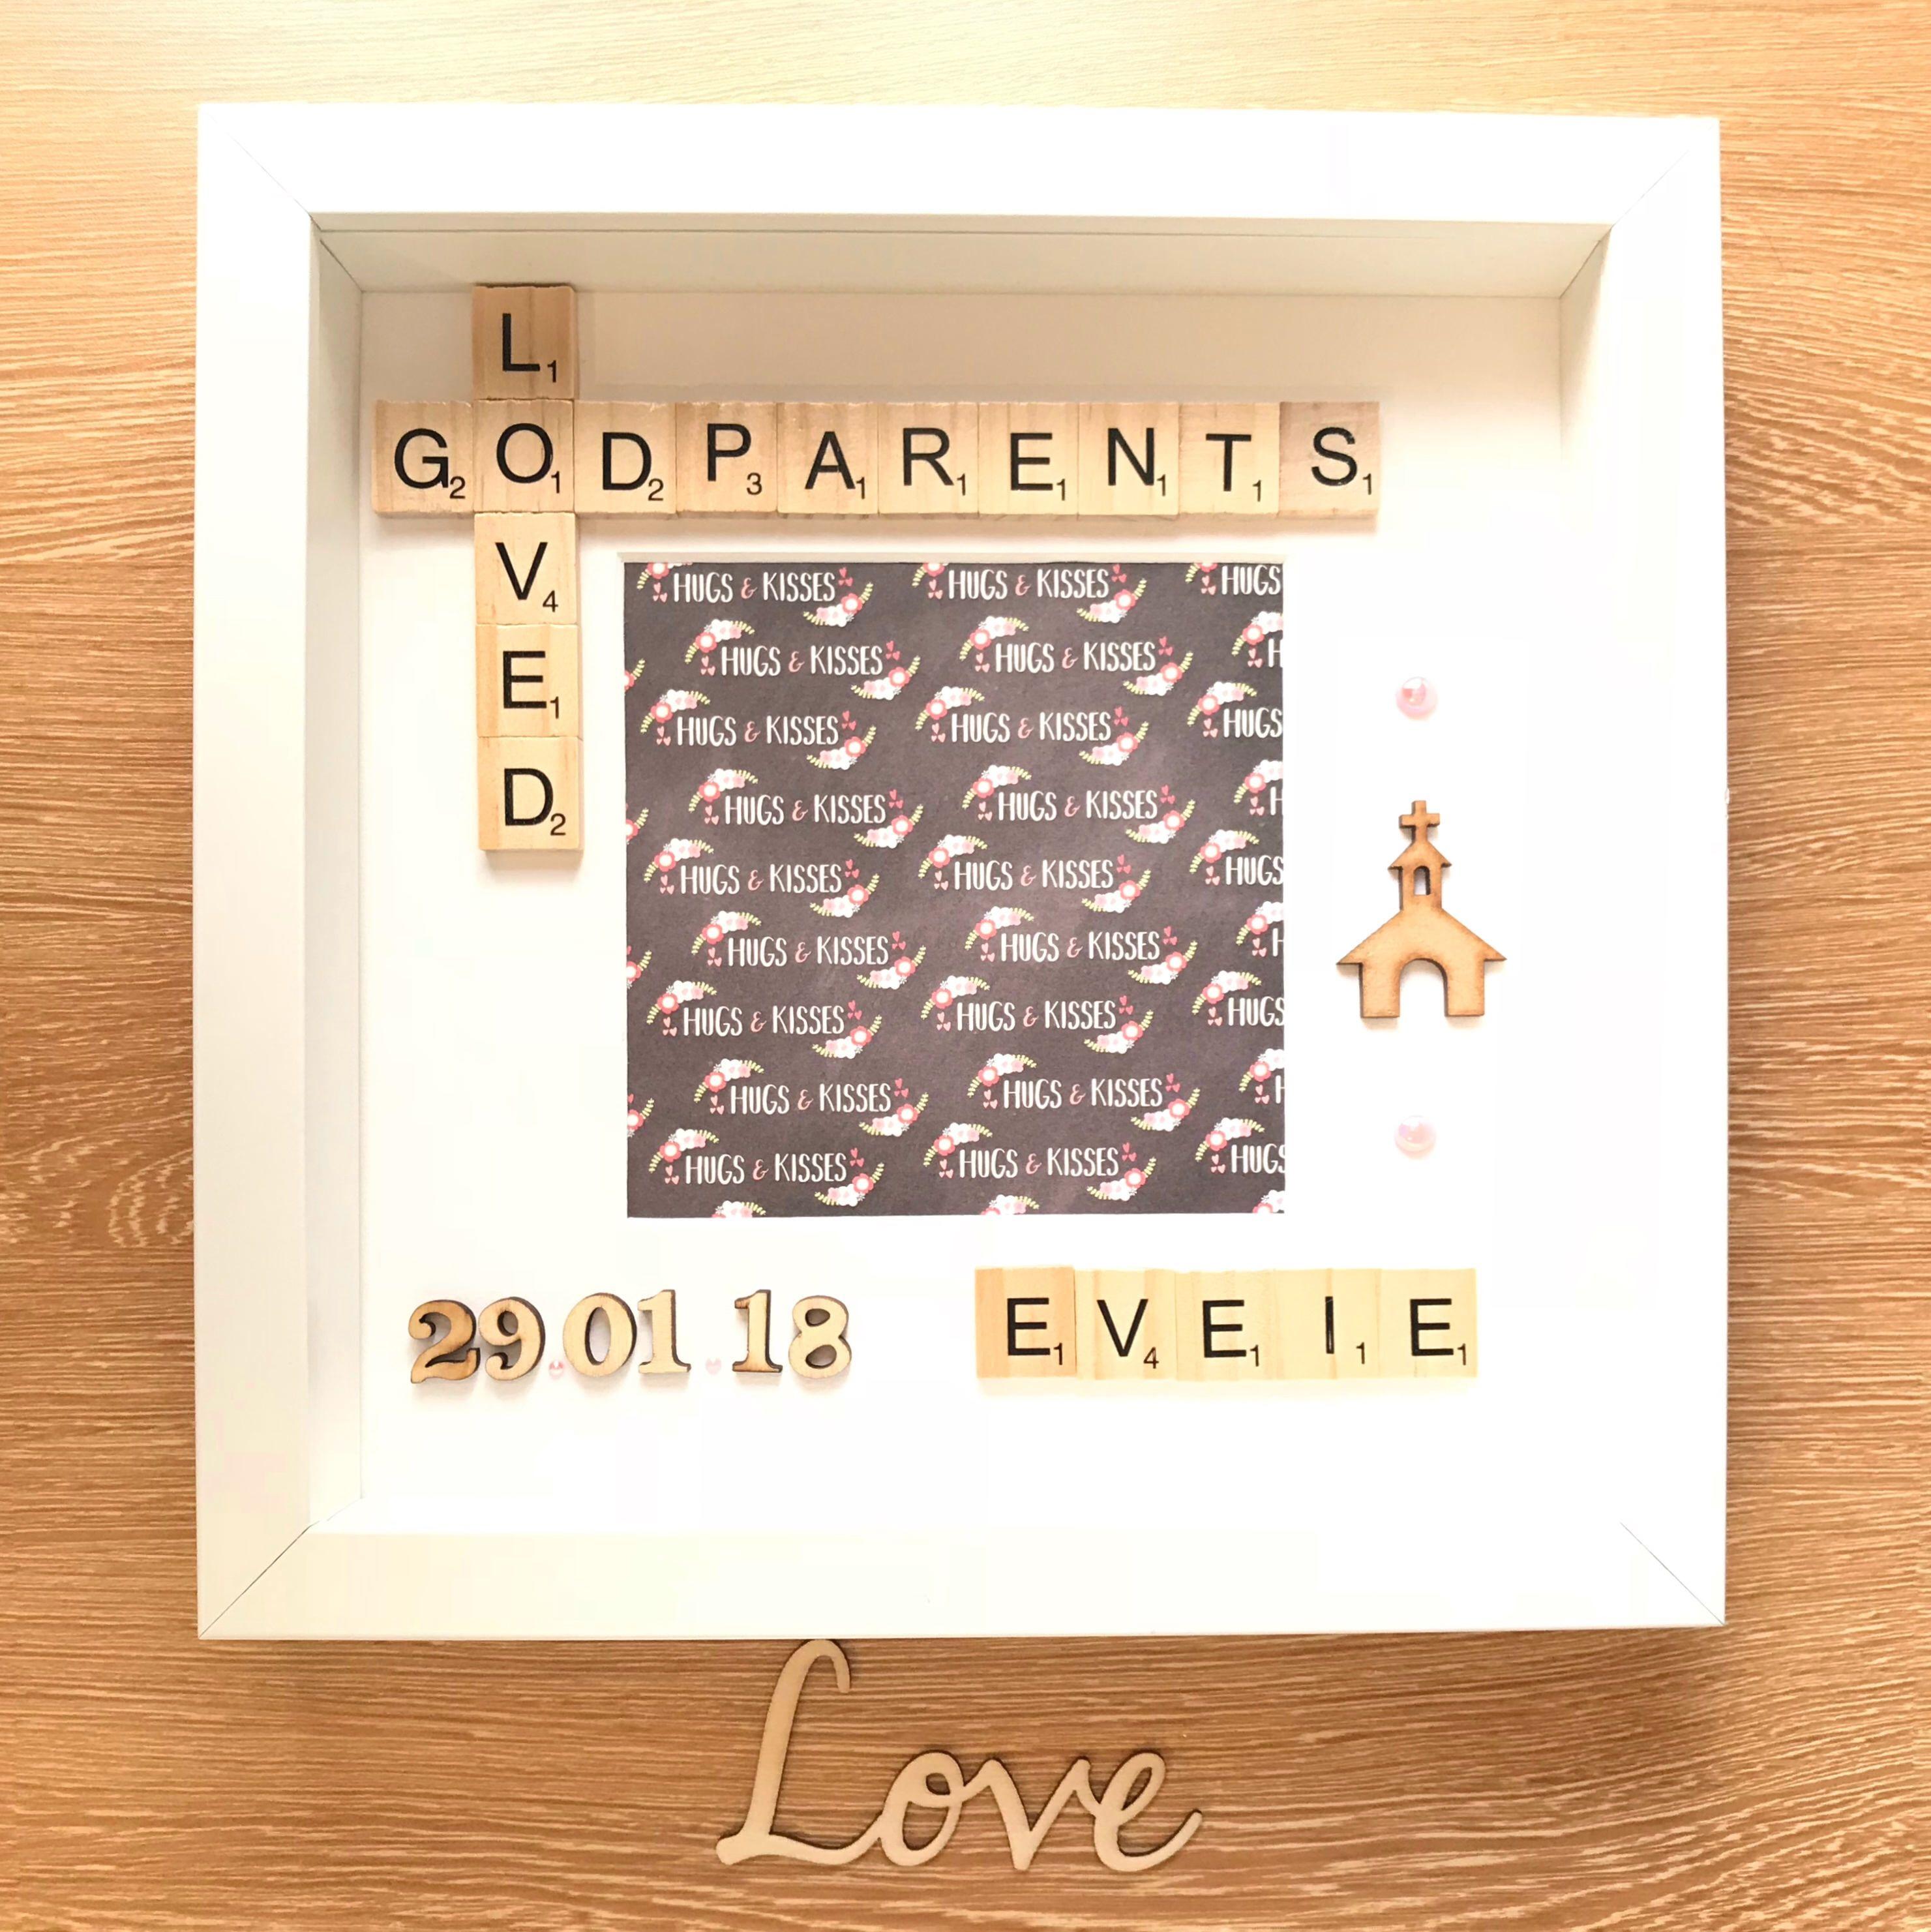 Godparents Scrabble Photo Box Frame. Gift for Godparents. Godmother ...